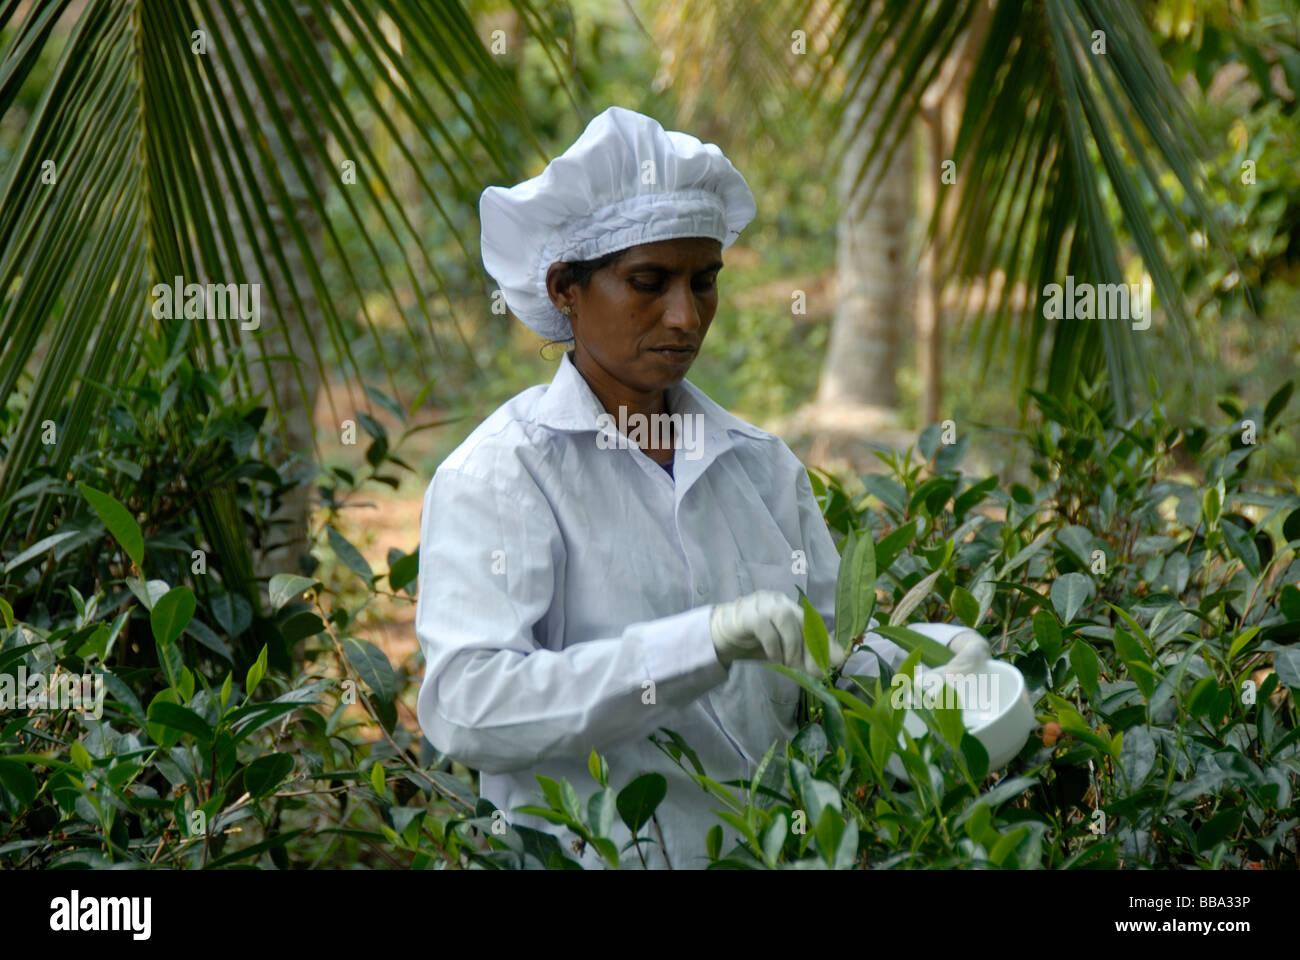 Tea harvest, Singhalese woman, tea plucker, picking tea leaves for white tea with gloves and scissors, Handunugoda - Stock Image